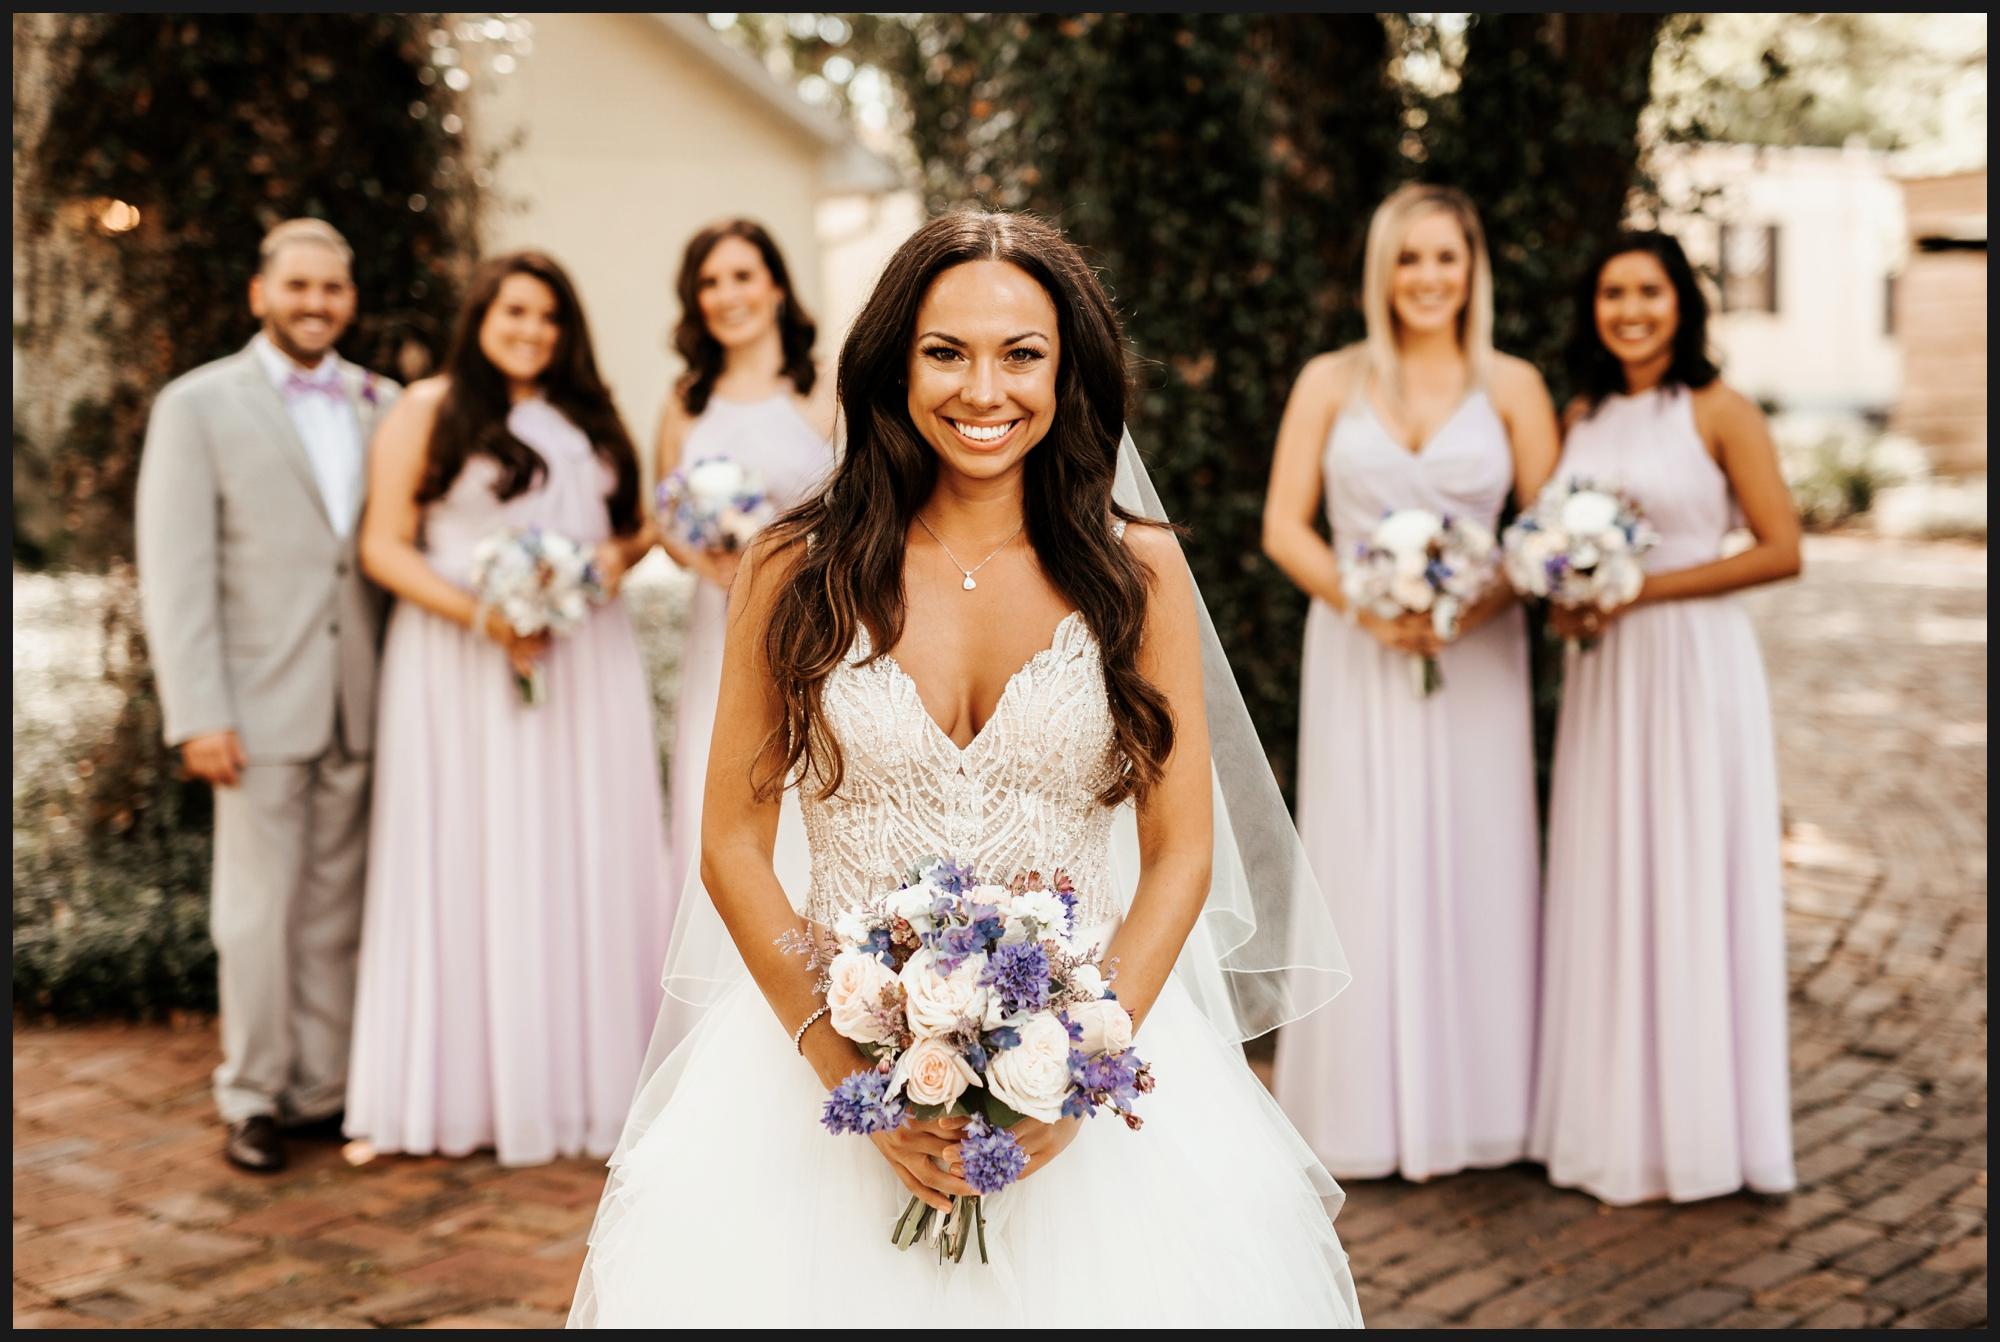 Orlando-Wedding-Photographer-destination-wedding-photographer-florida-wedding-photographer-bohemian-wedding-photographer_1605.jpg